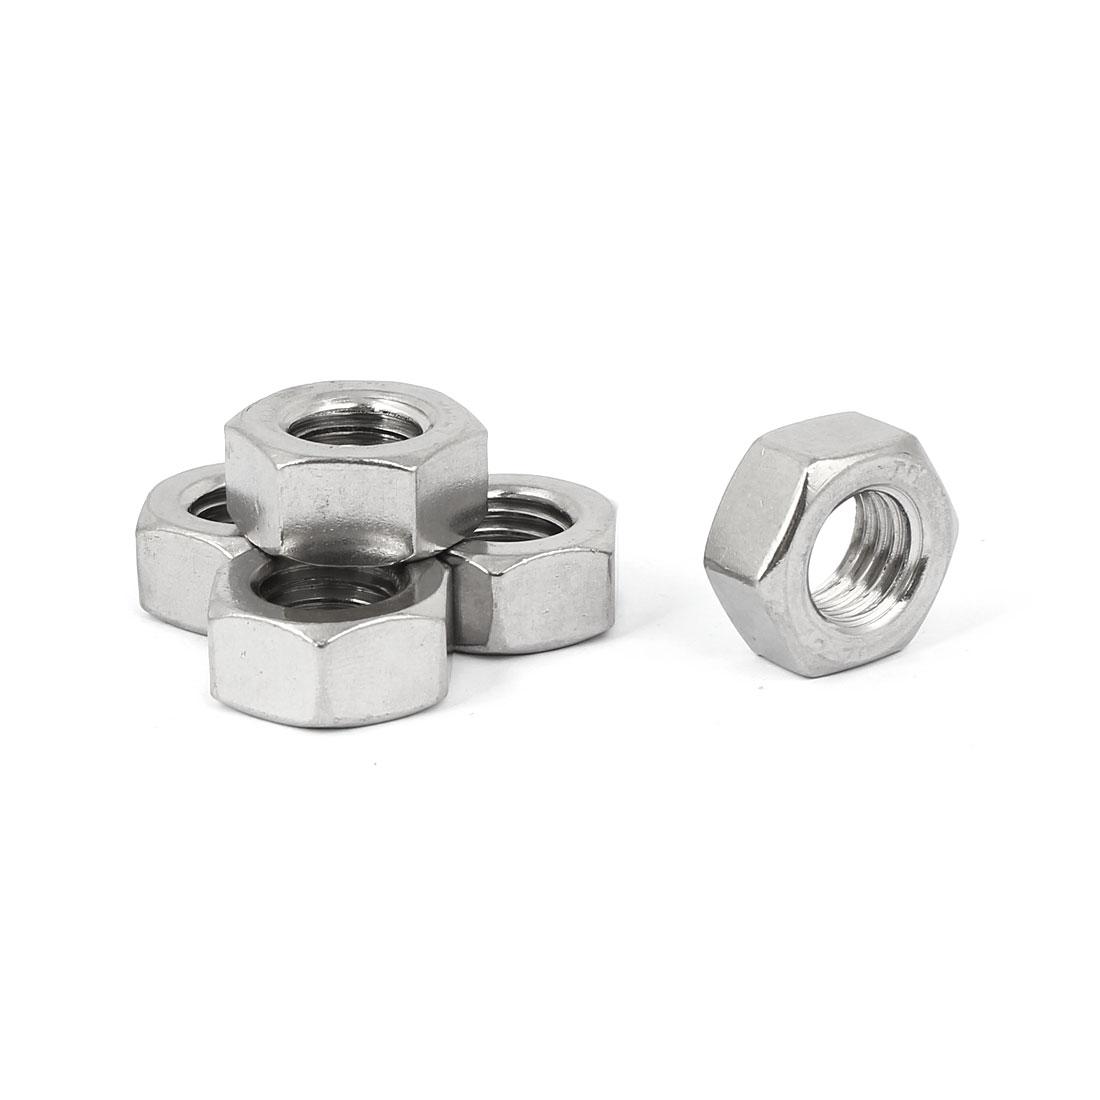 M14 Thread Dia 304 Stainless Steel Hex Nut Screw Cap Fastener Silver Tone 5pcs